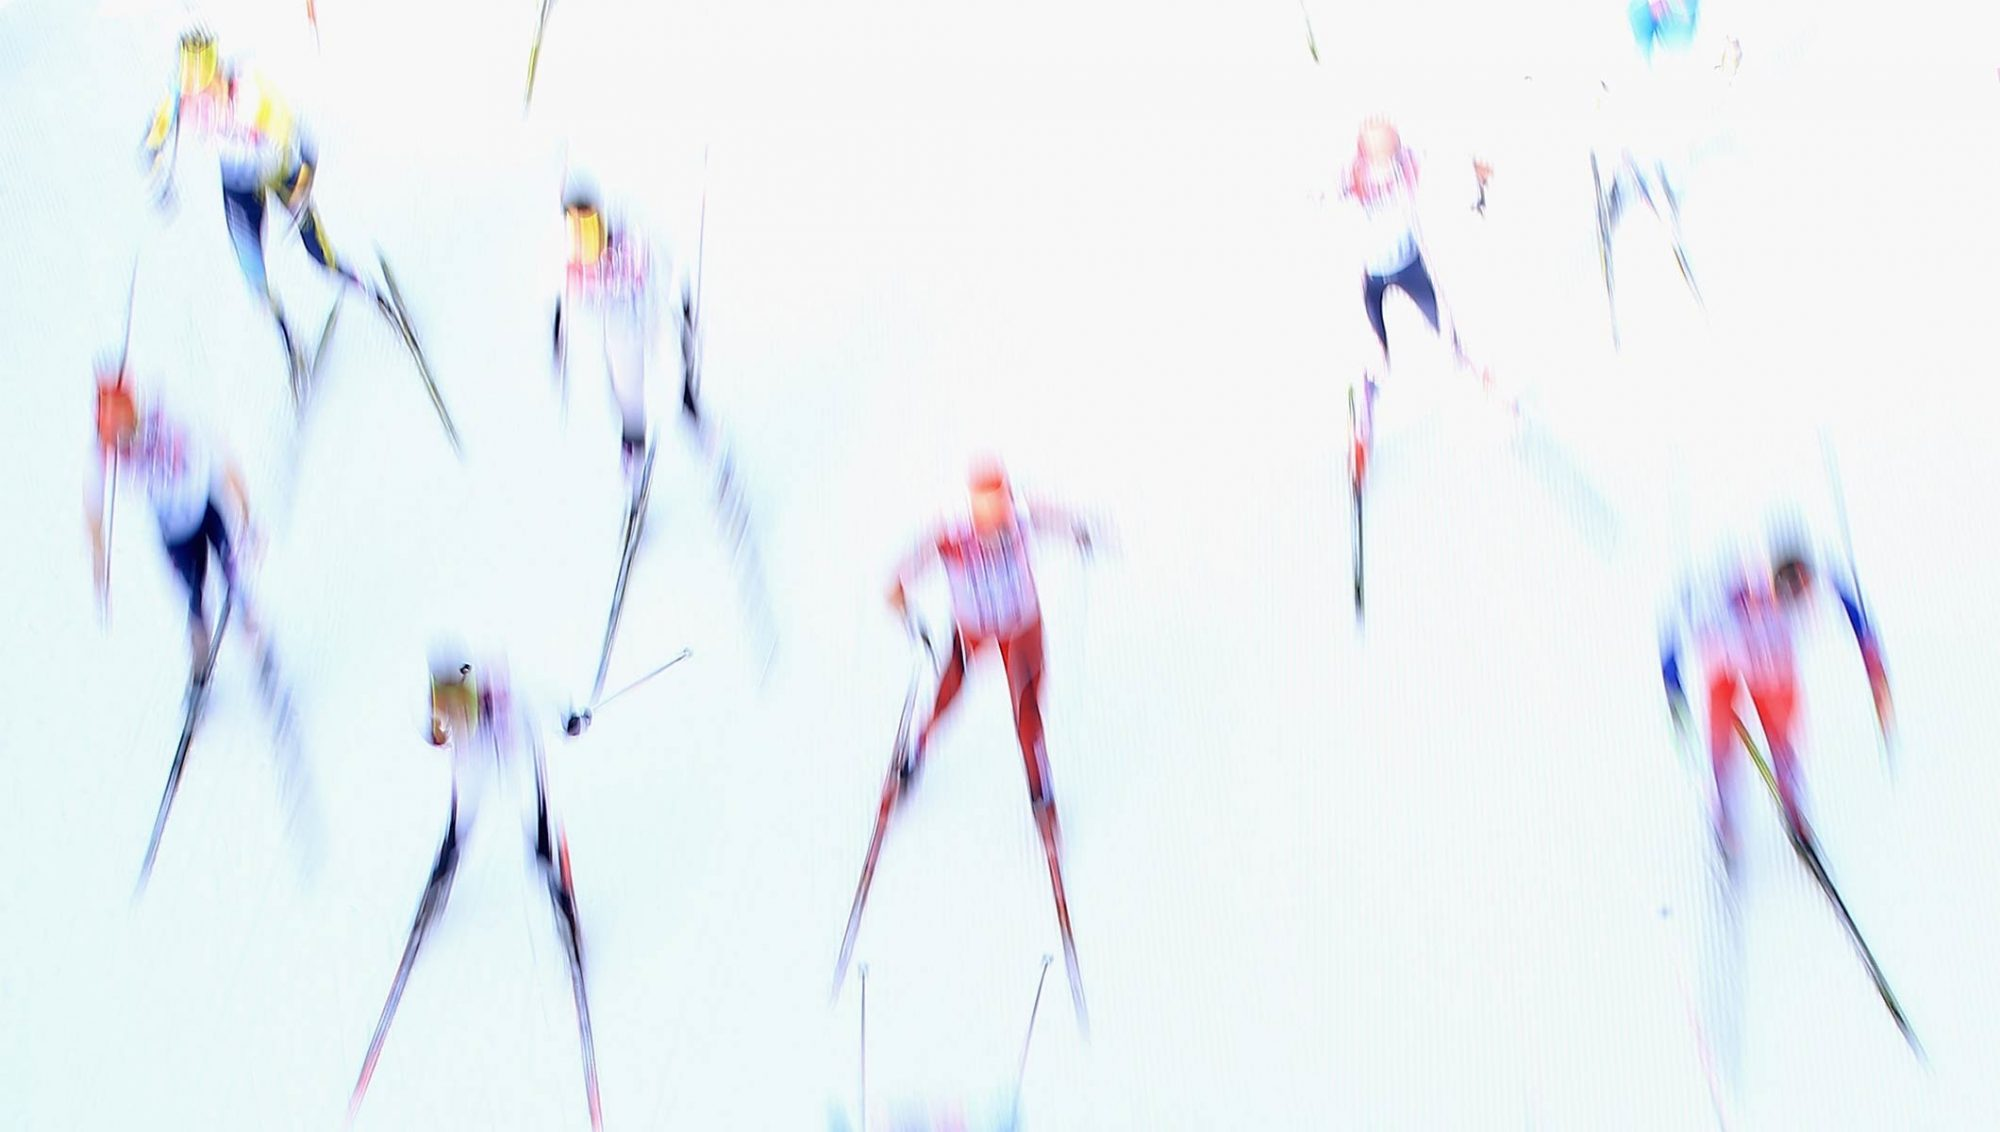 Олимпиада 2018 лыжники лыжный спорт